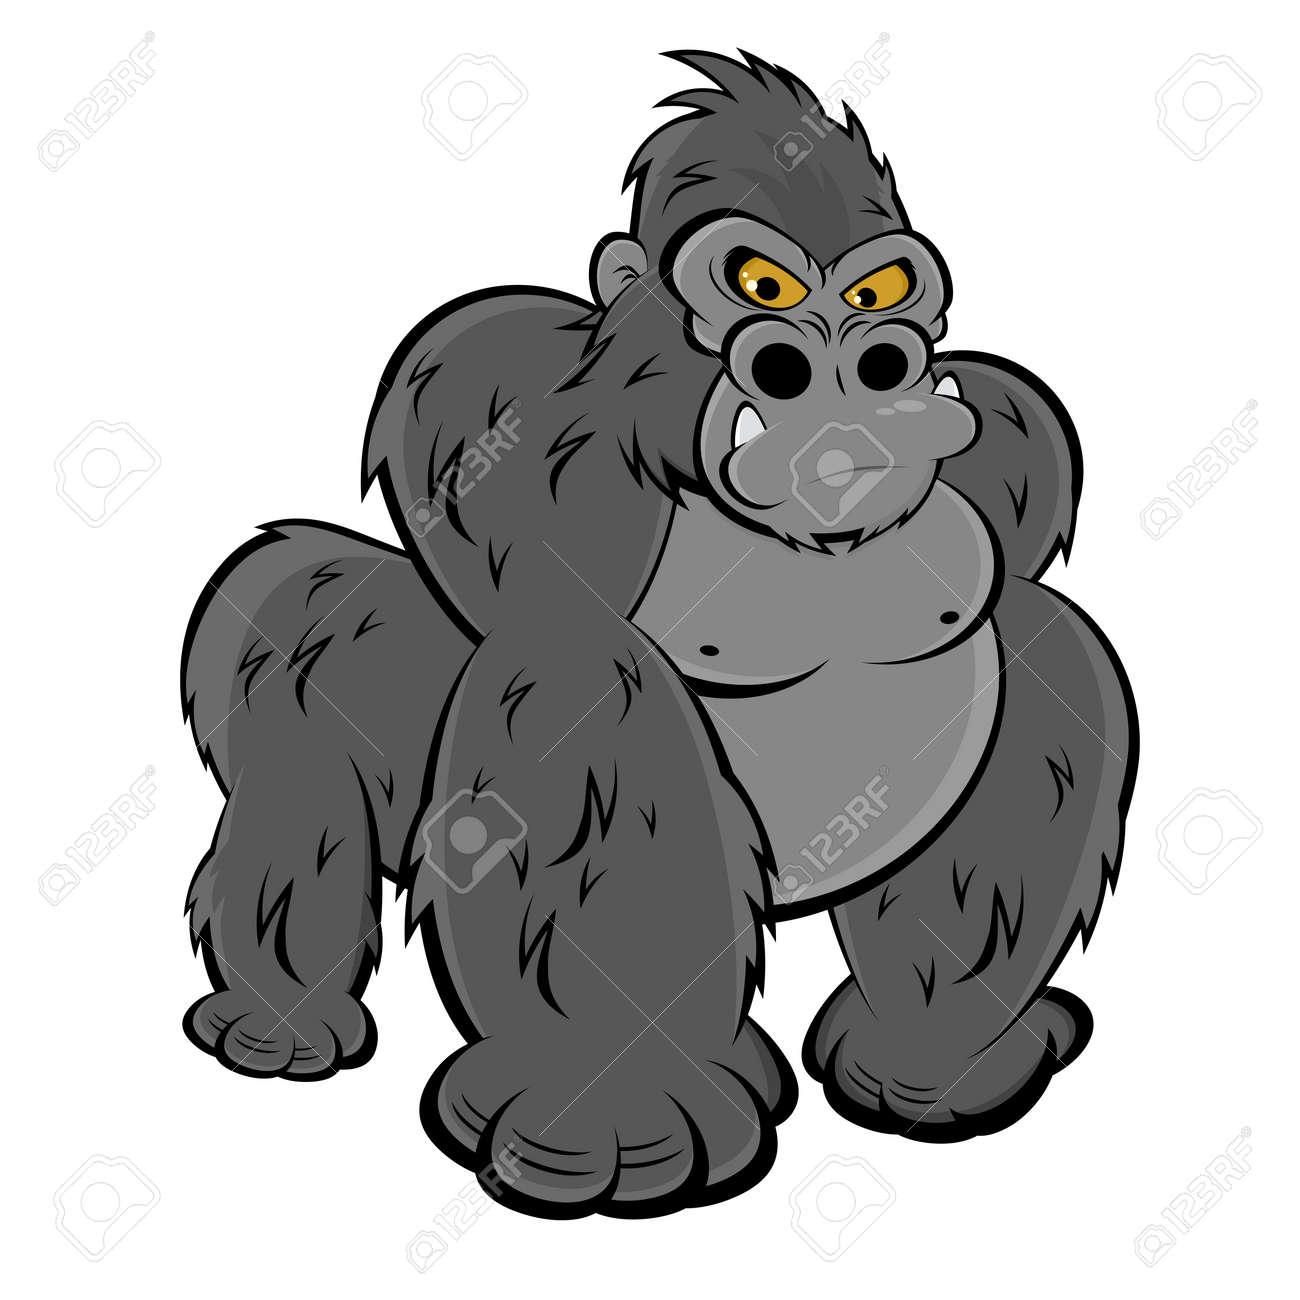 angry gorilla Standard-Bild - 20111899